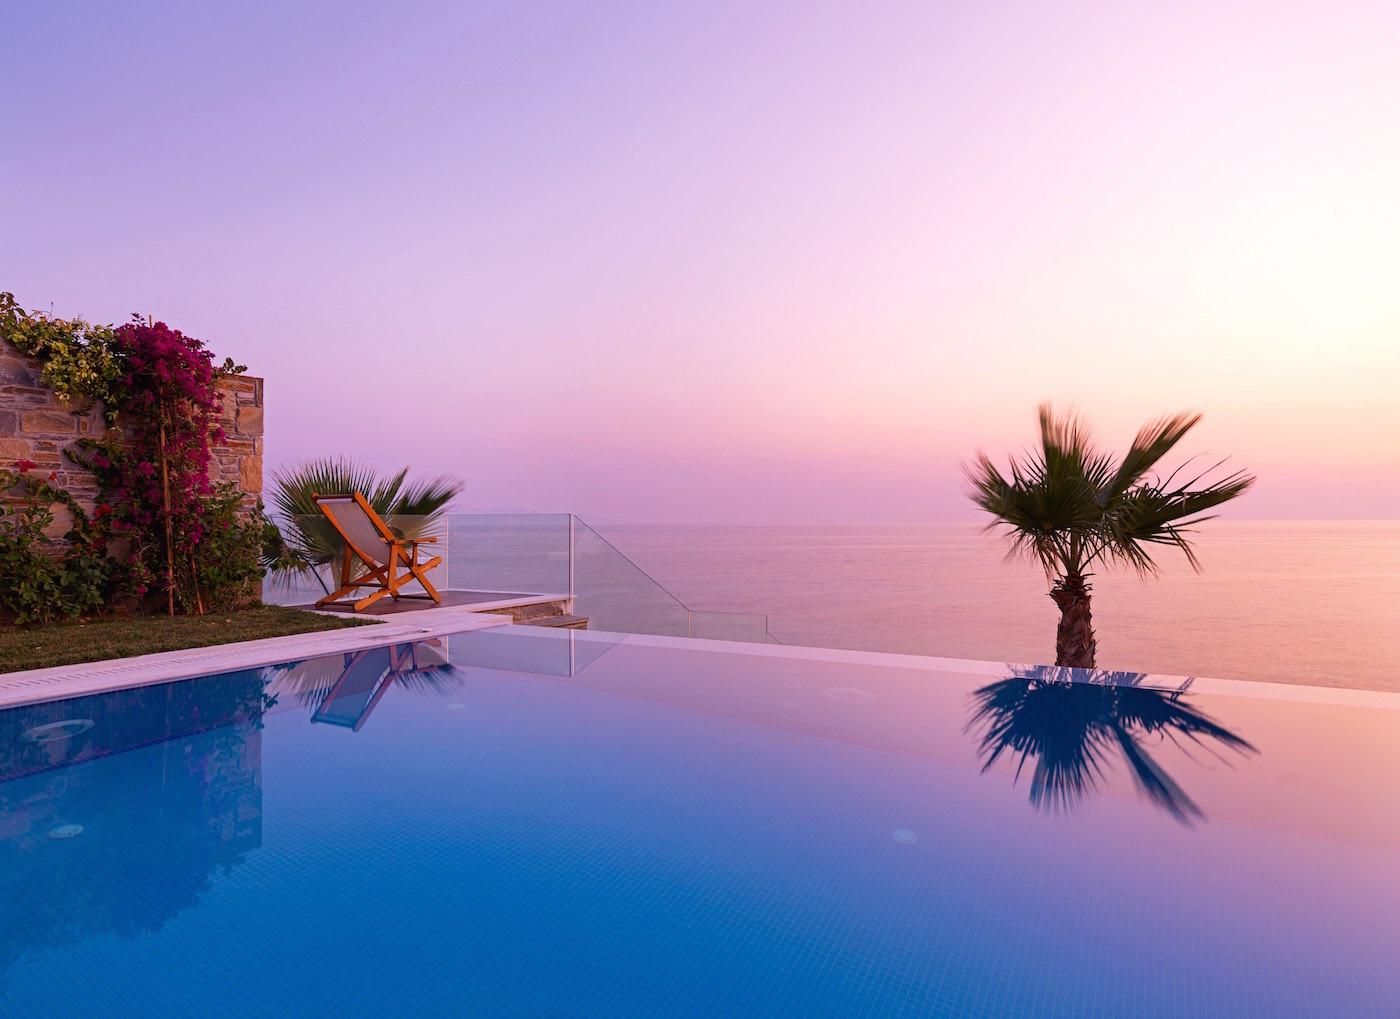 Porto-Zante-Greece-Top-Hotels-Best-Villas-Private-Beach-Beachfront-Best-Beach-Resort-Crystal-Water-Sandy-Beach-2-3953-1400_pixelsOCT2015